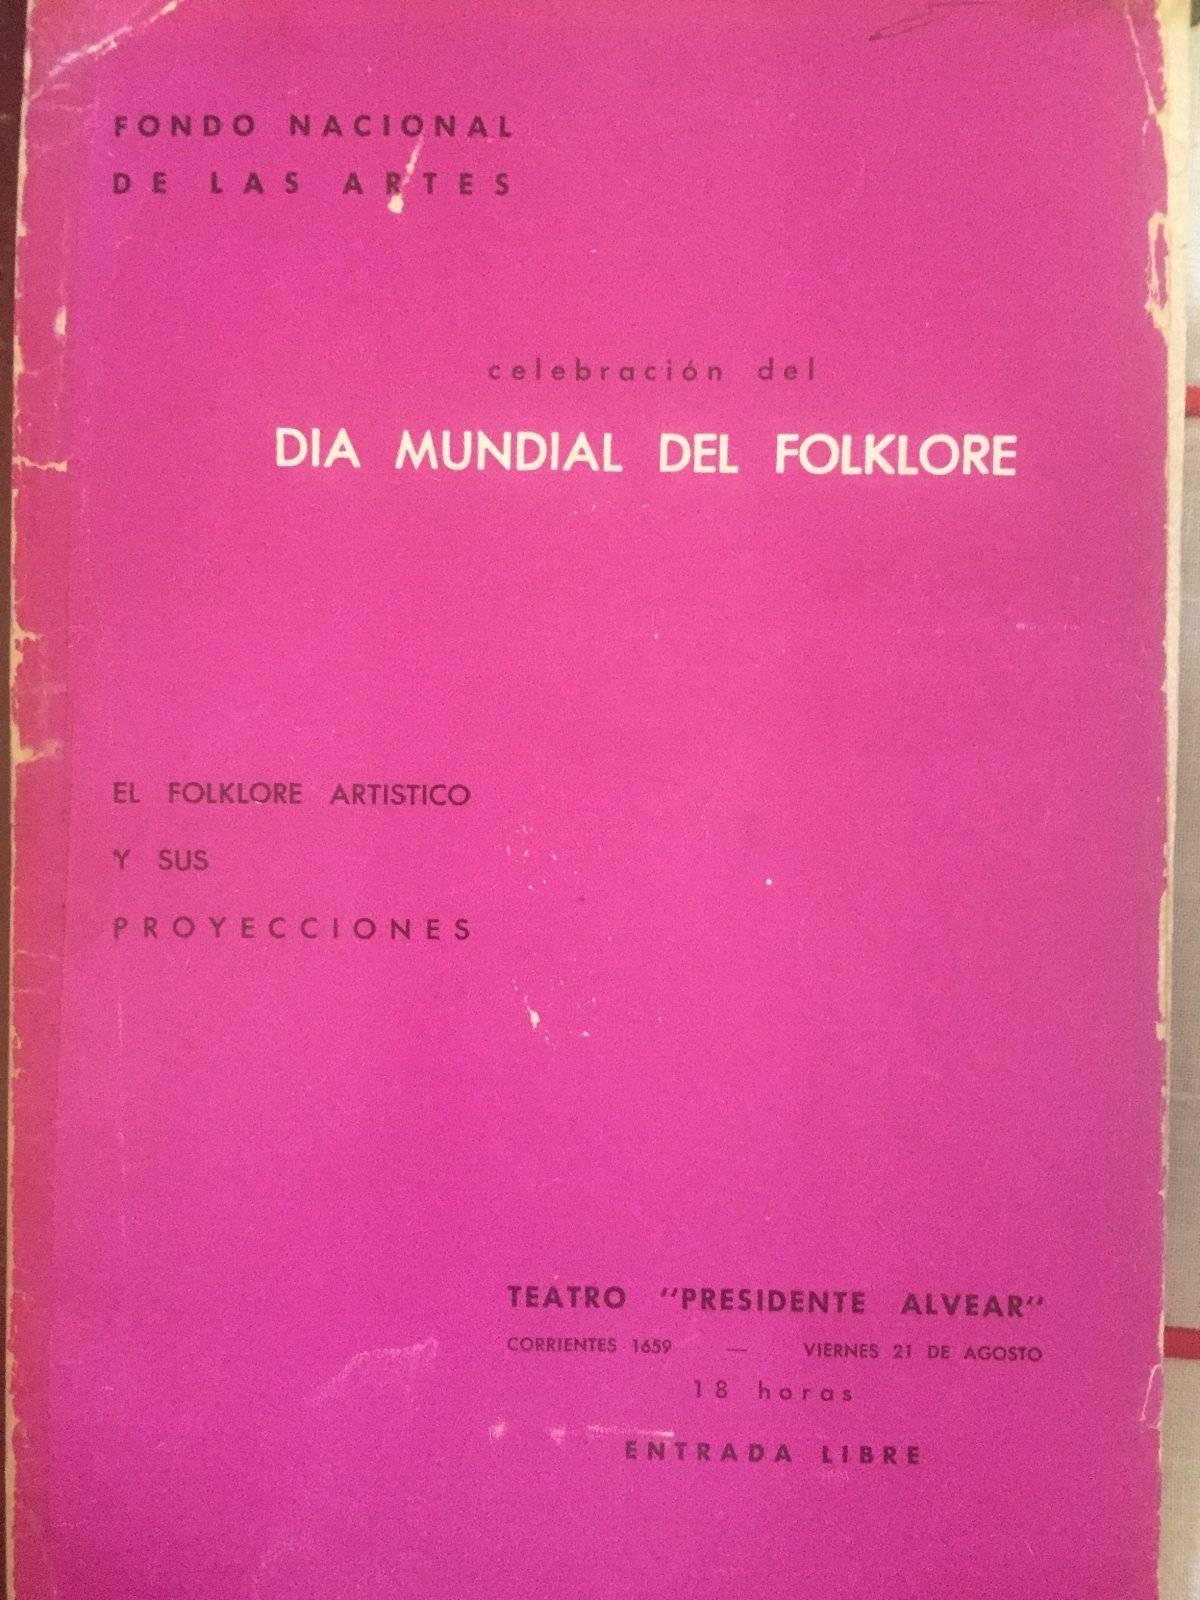 Xiomarita Pérez: